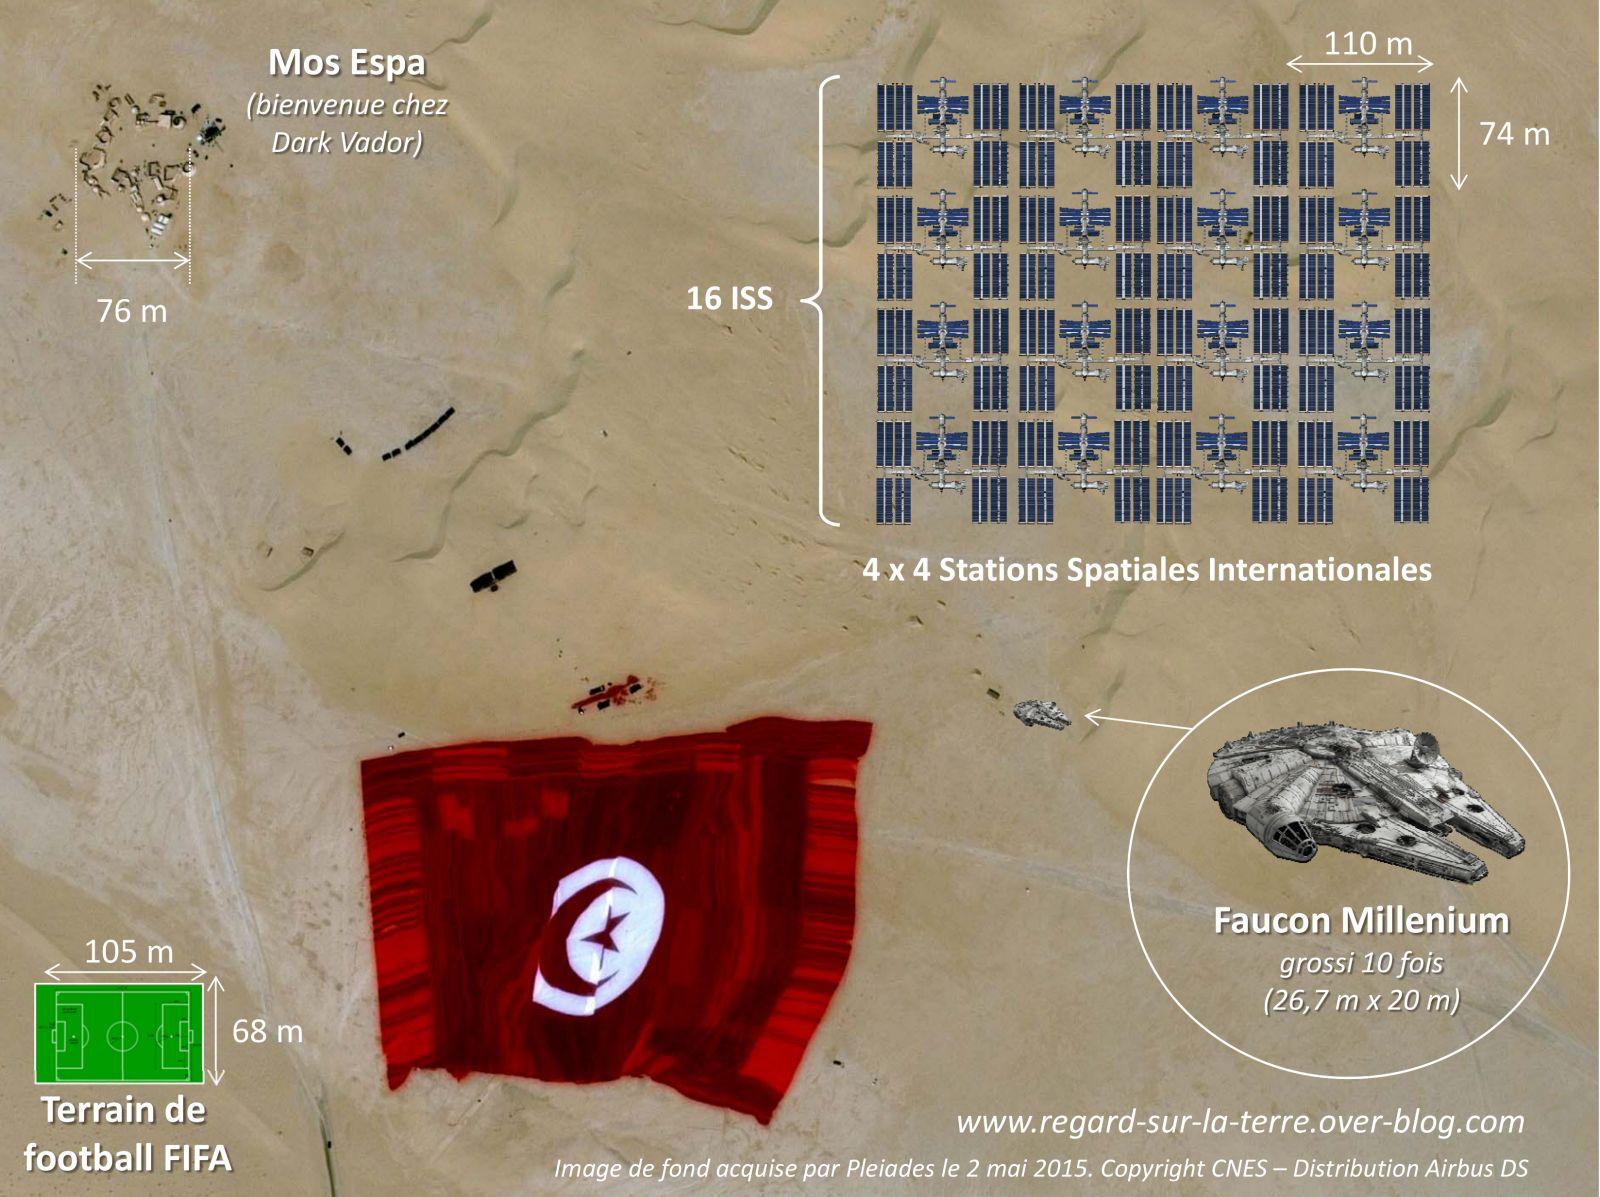 Tunisie - Record du plus grand drapeau - Guinness - Satellites Pléiades - Terrain de football - ISS - Faucon millénium - Mos Espa - Dark Vador - Star Wars - CNES - Airbus Defence and Space